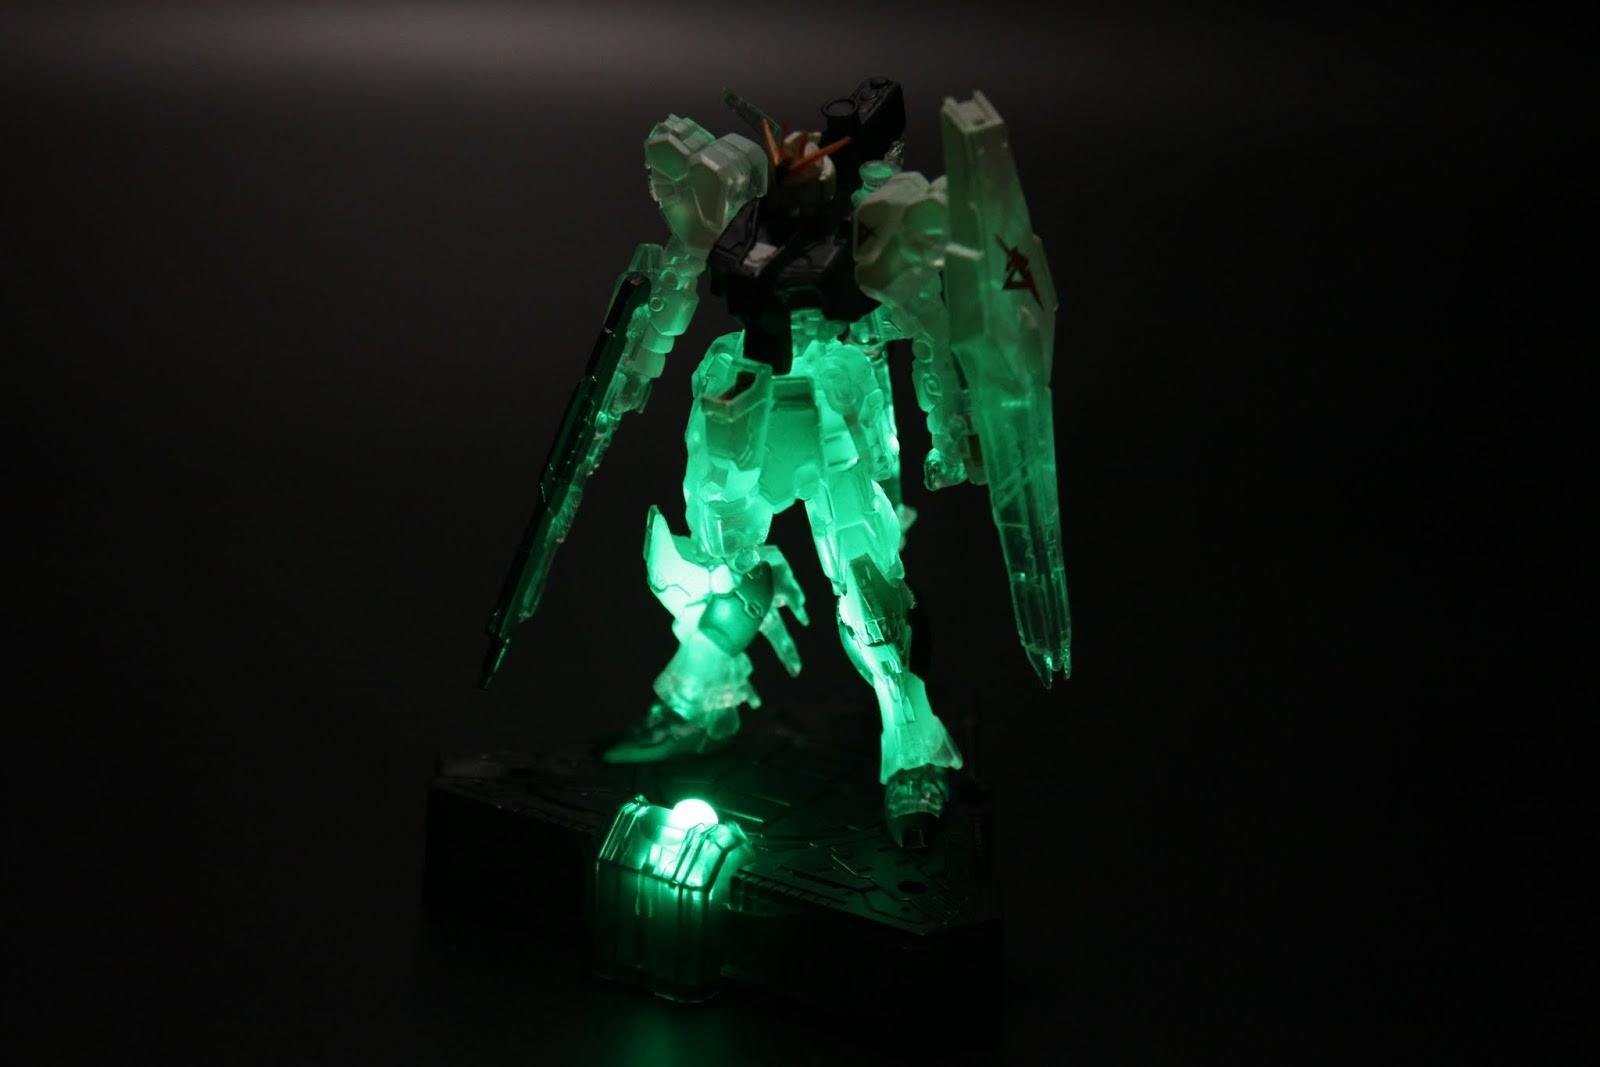 Nu Gundam用綠色應該也是呼應原作